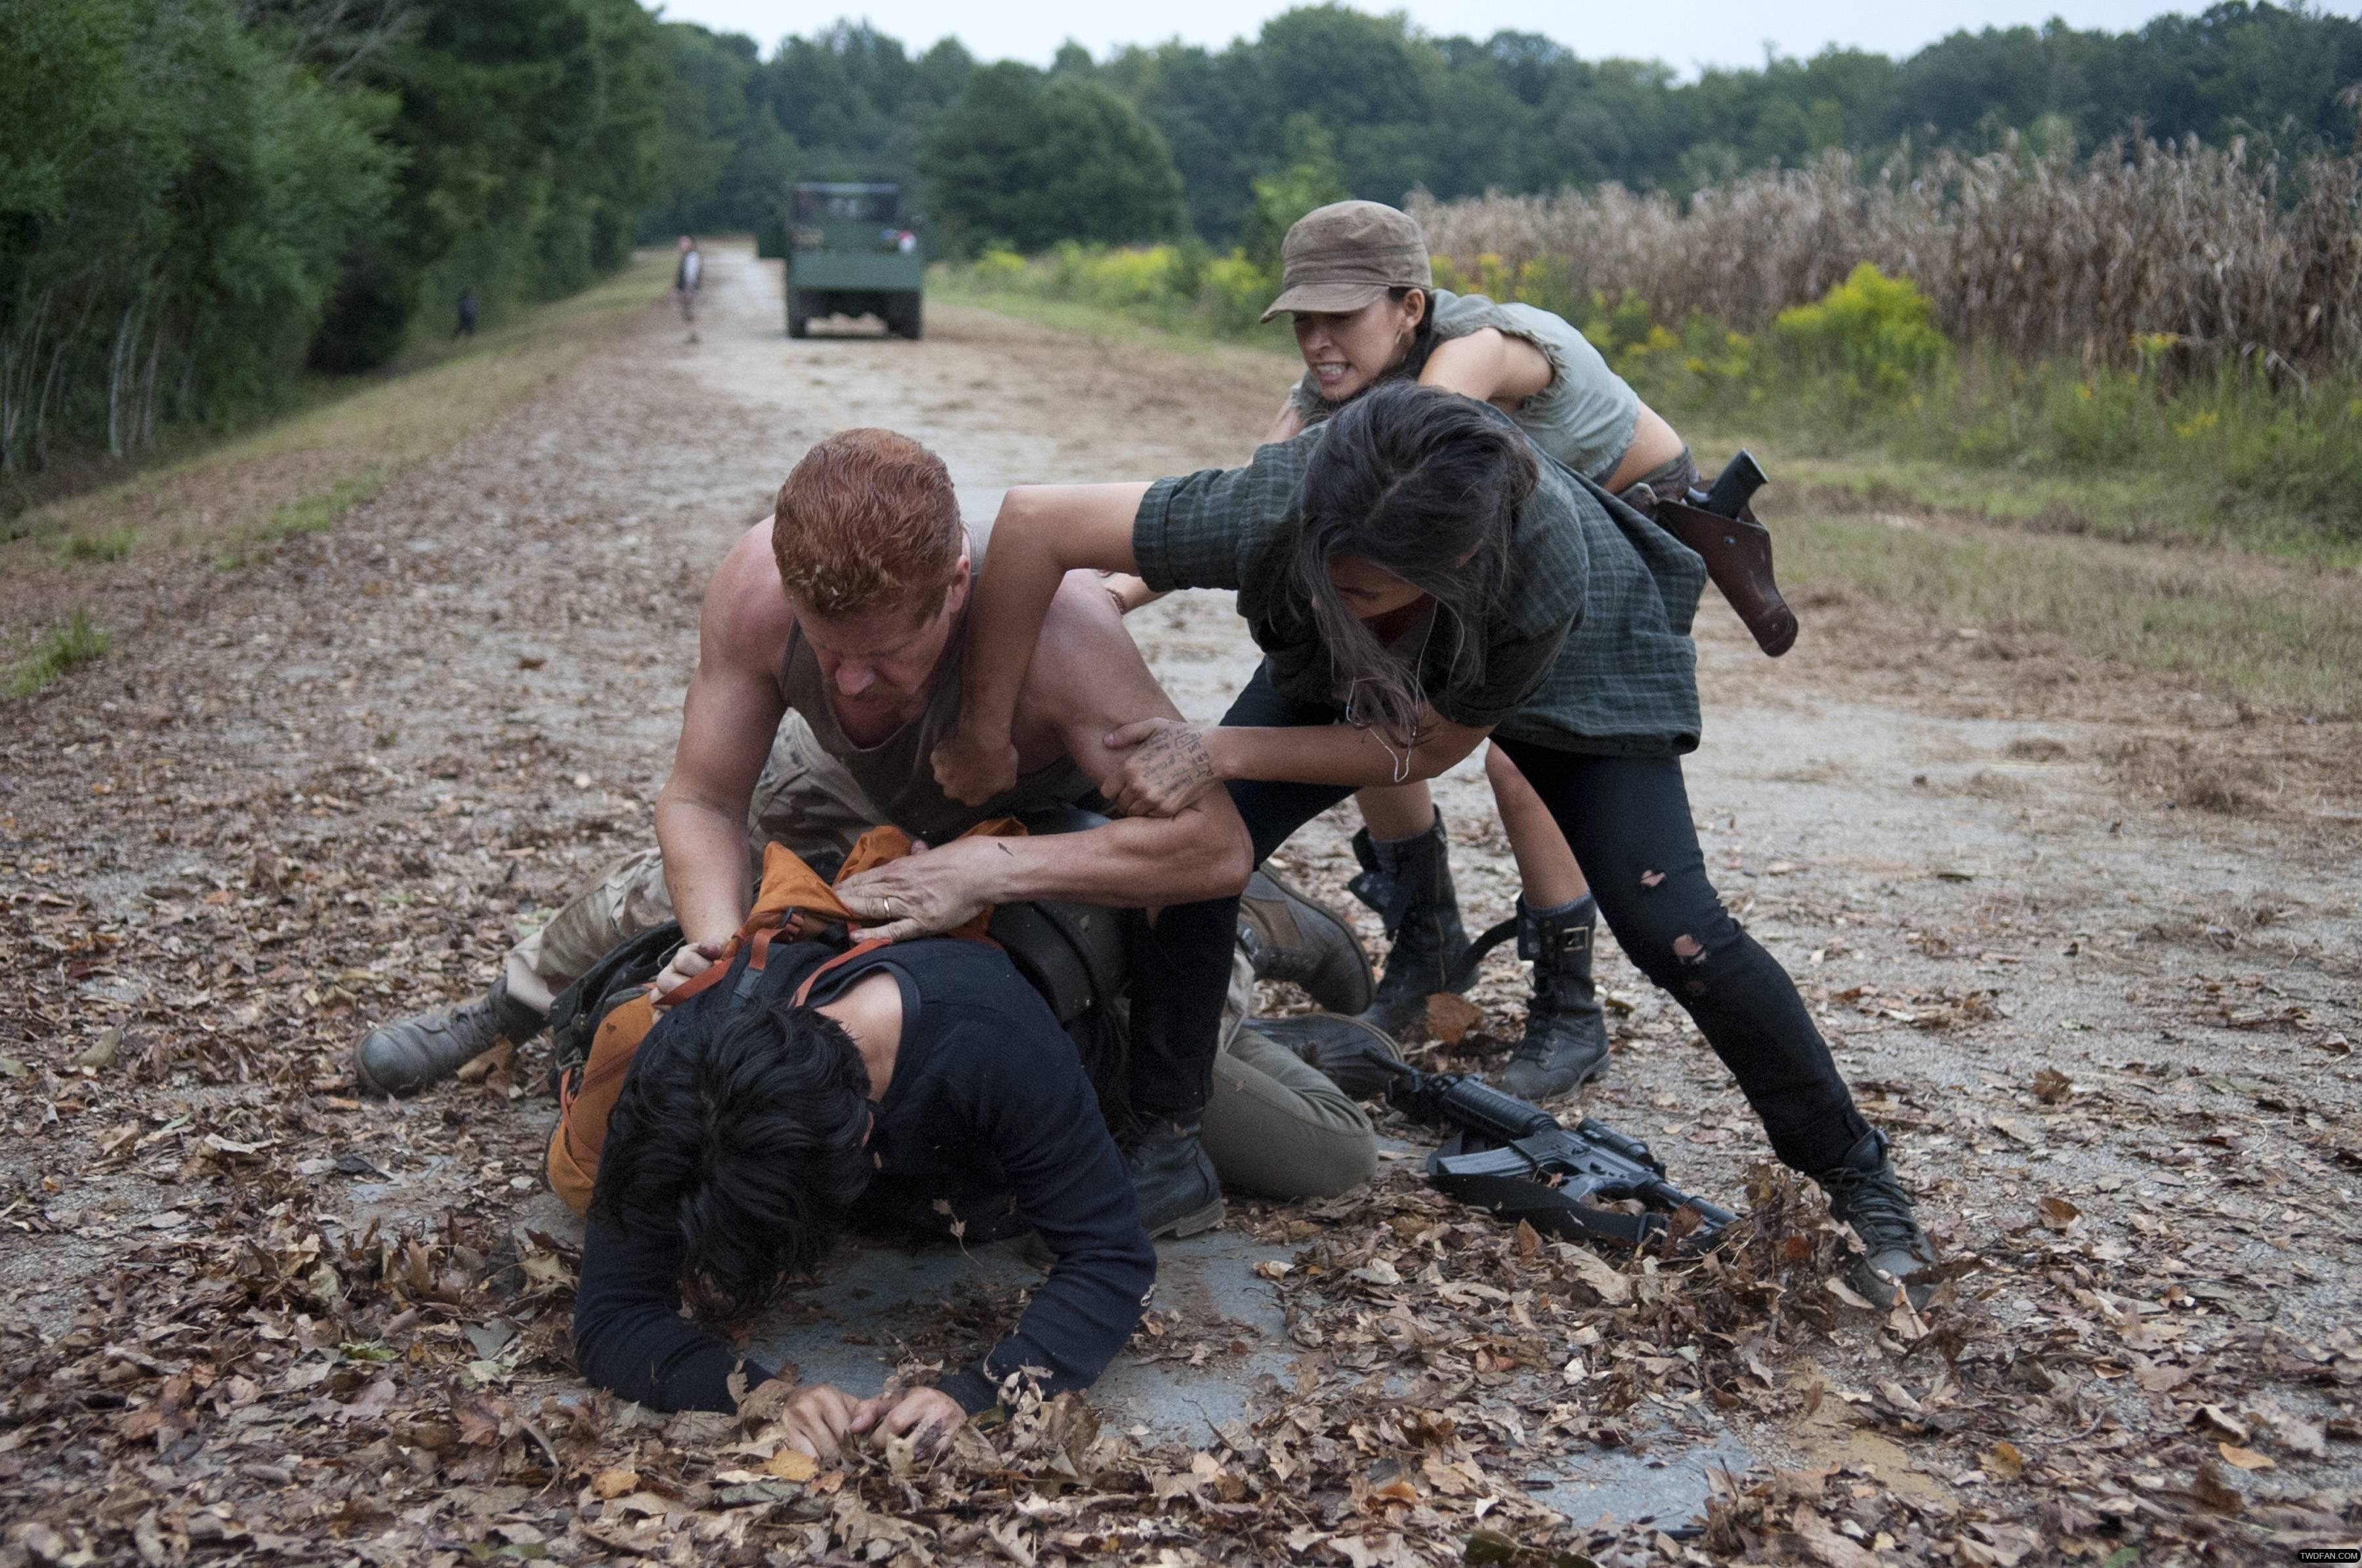 The-Walking-Dead-4-Temporada-S04E11-Claimed-HQ-011